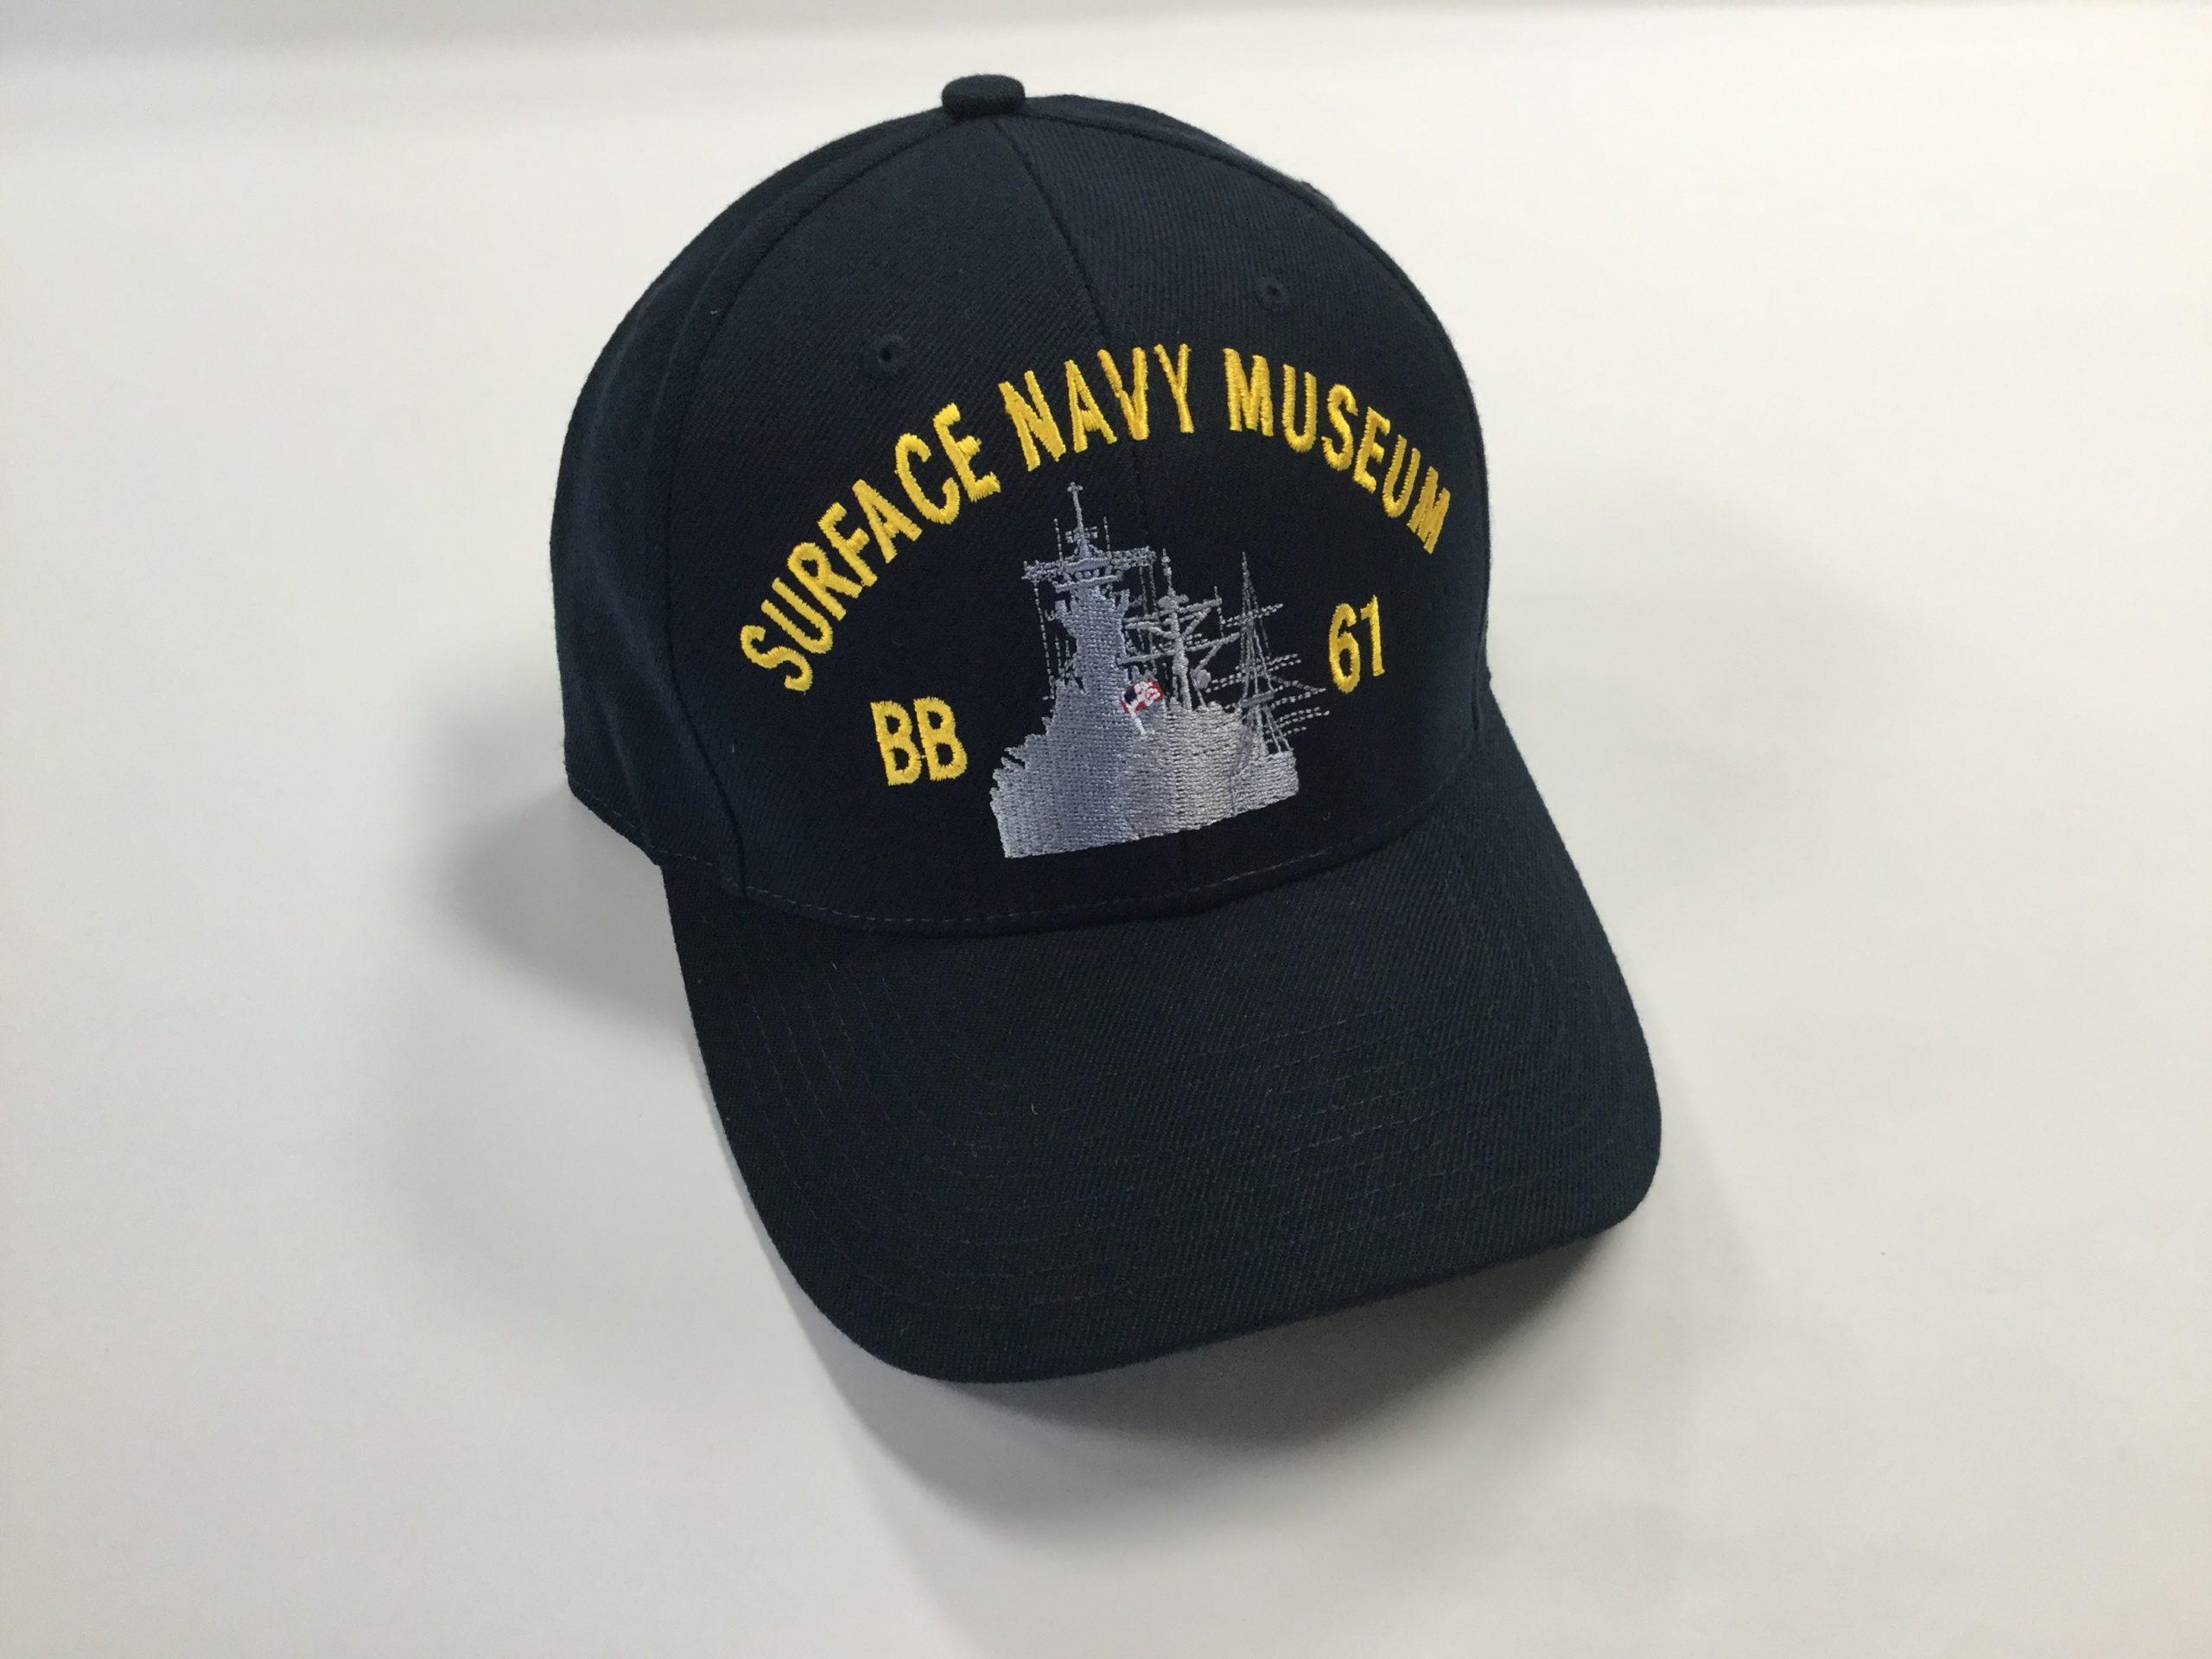 Baseball Cap - Surface Navy Museum